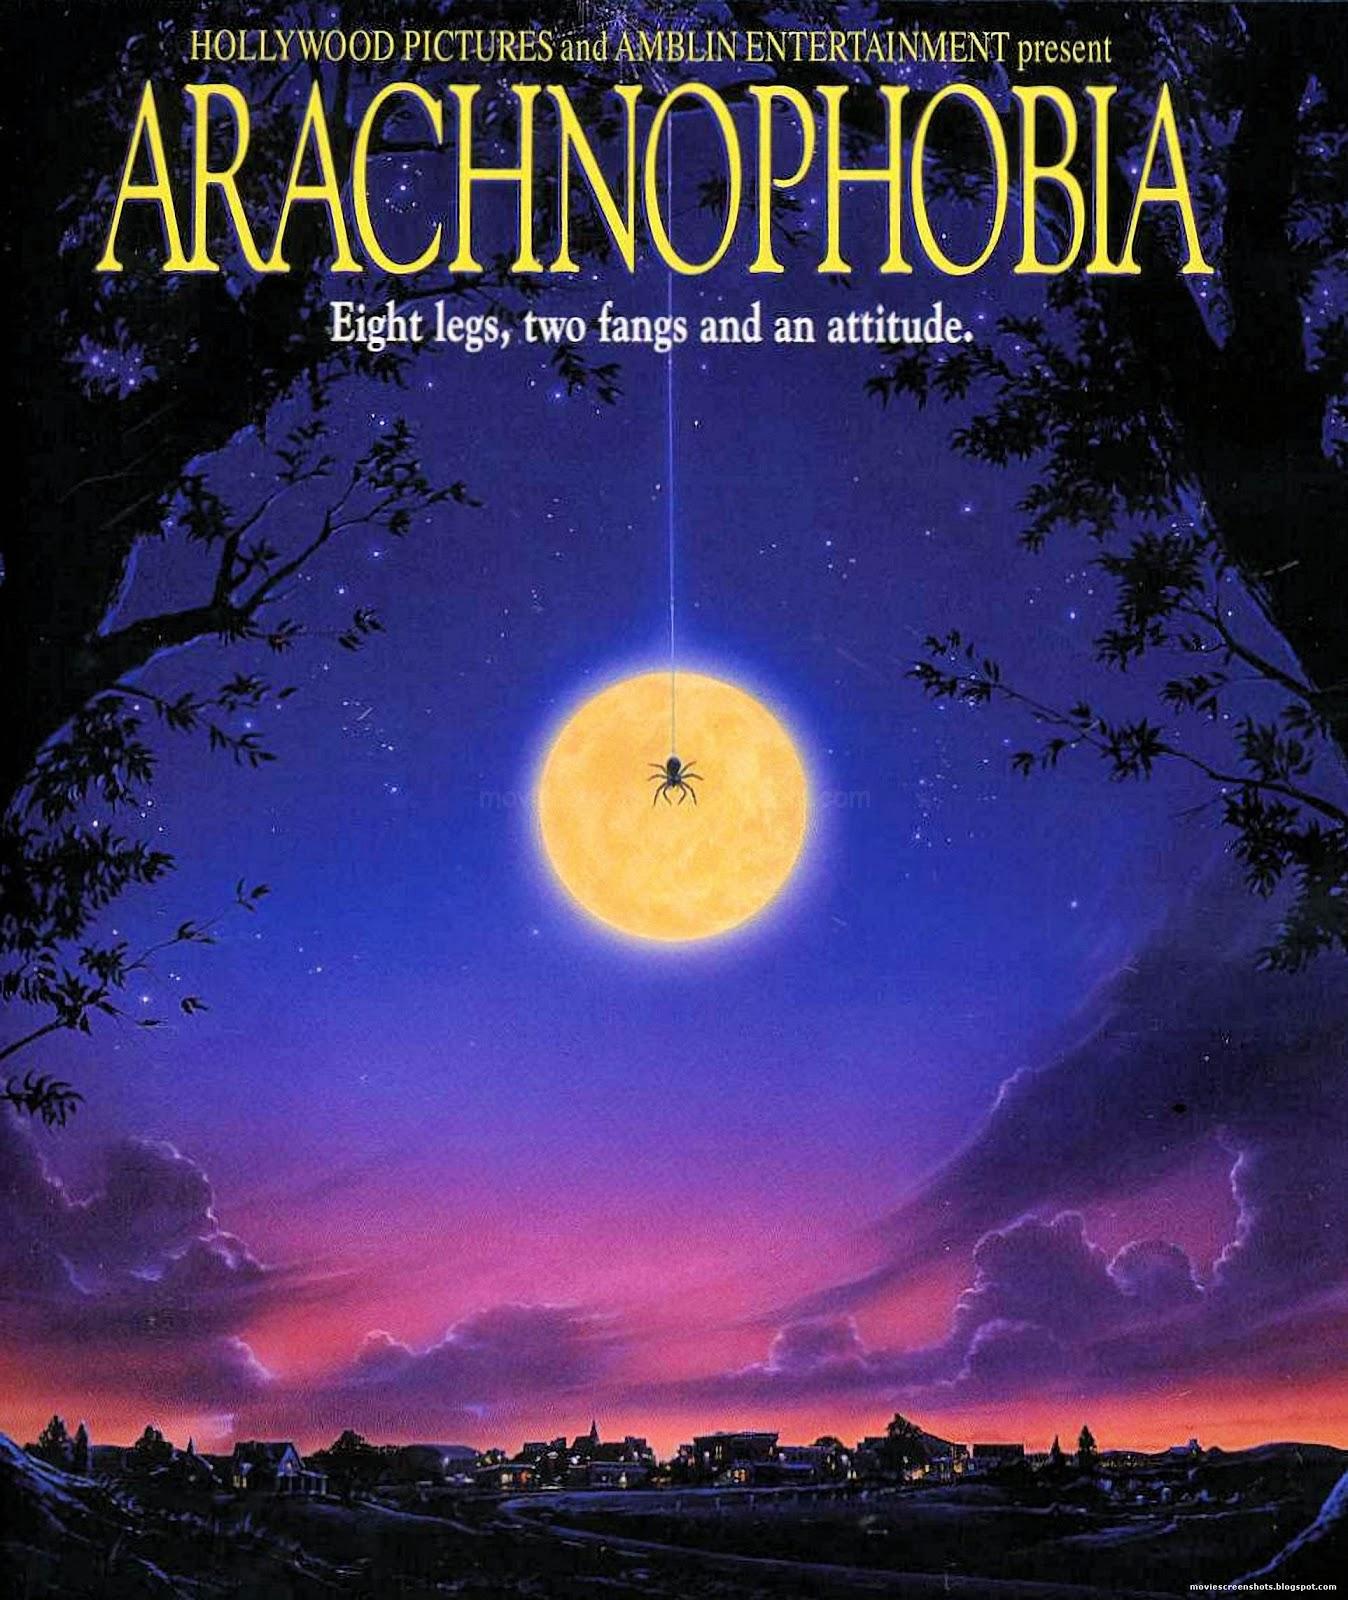 Arachnophobia Film